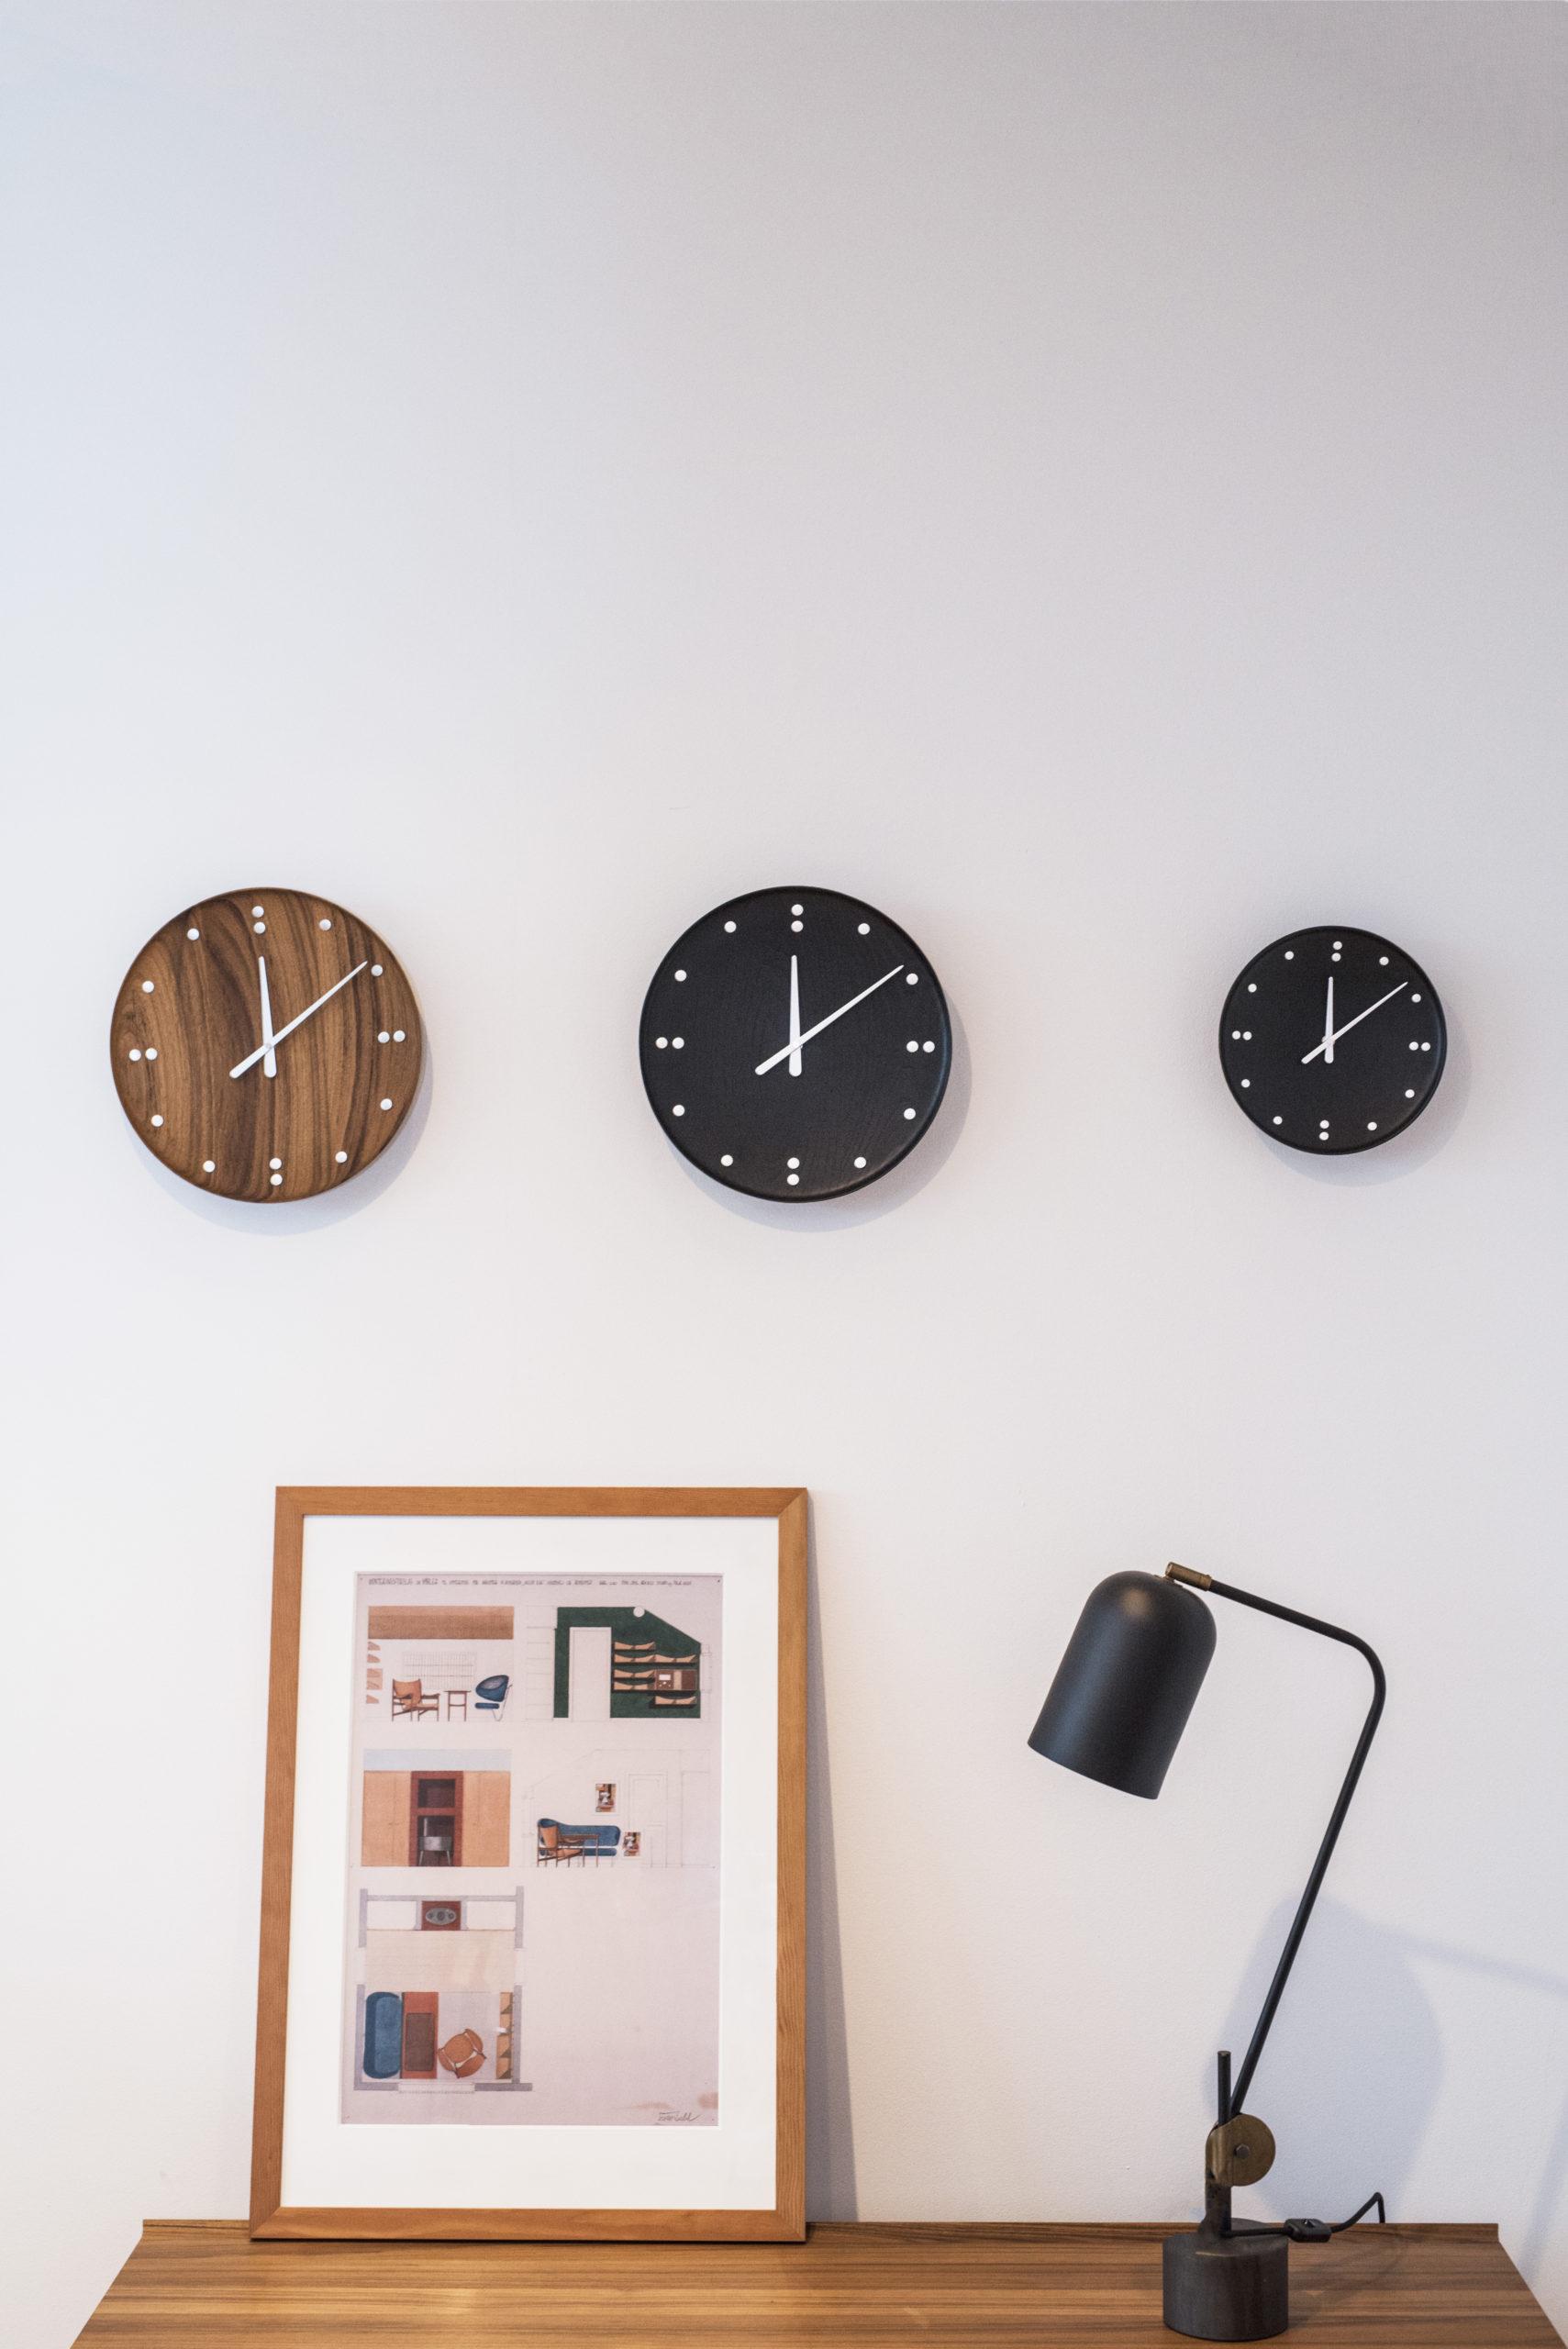 Architectmade-FJ-Clock-Wall-Clock-Teak-and-Ash-Wood-Denmark-Finn-Juhl-1